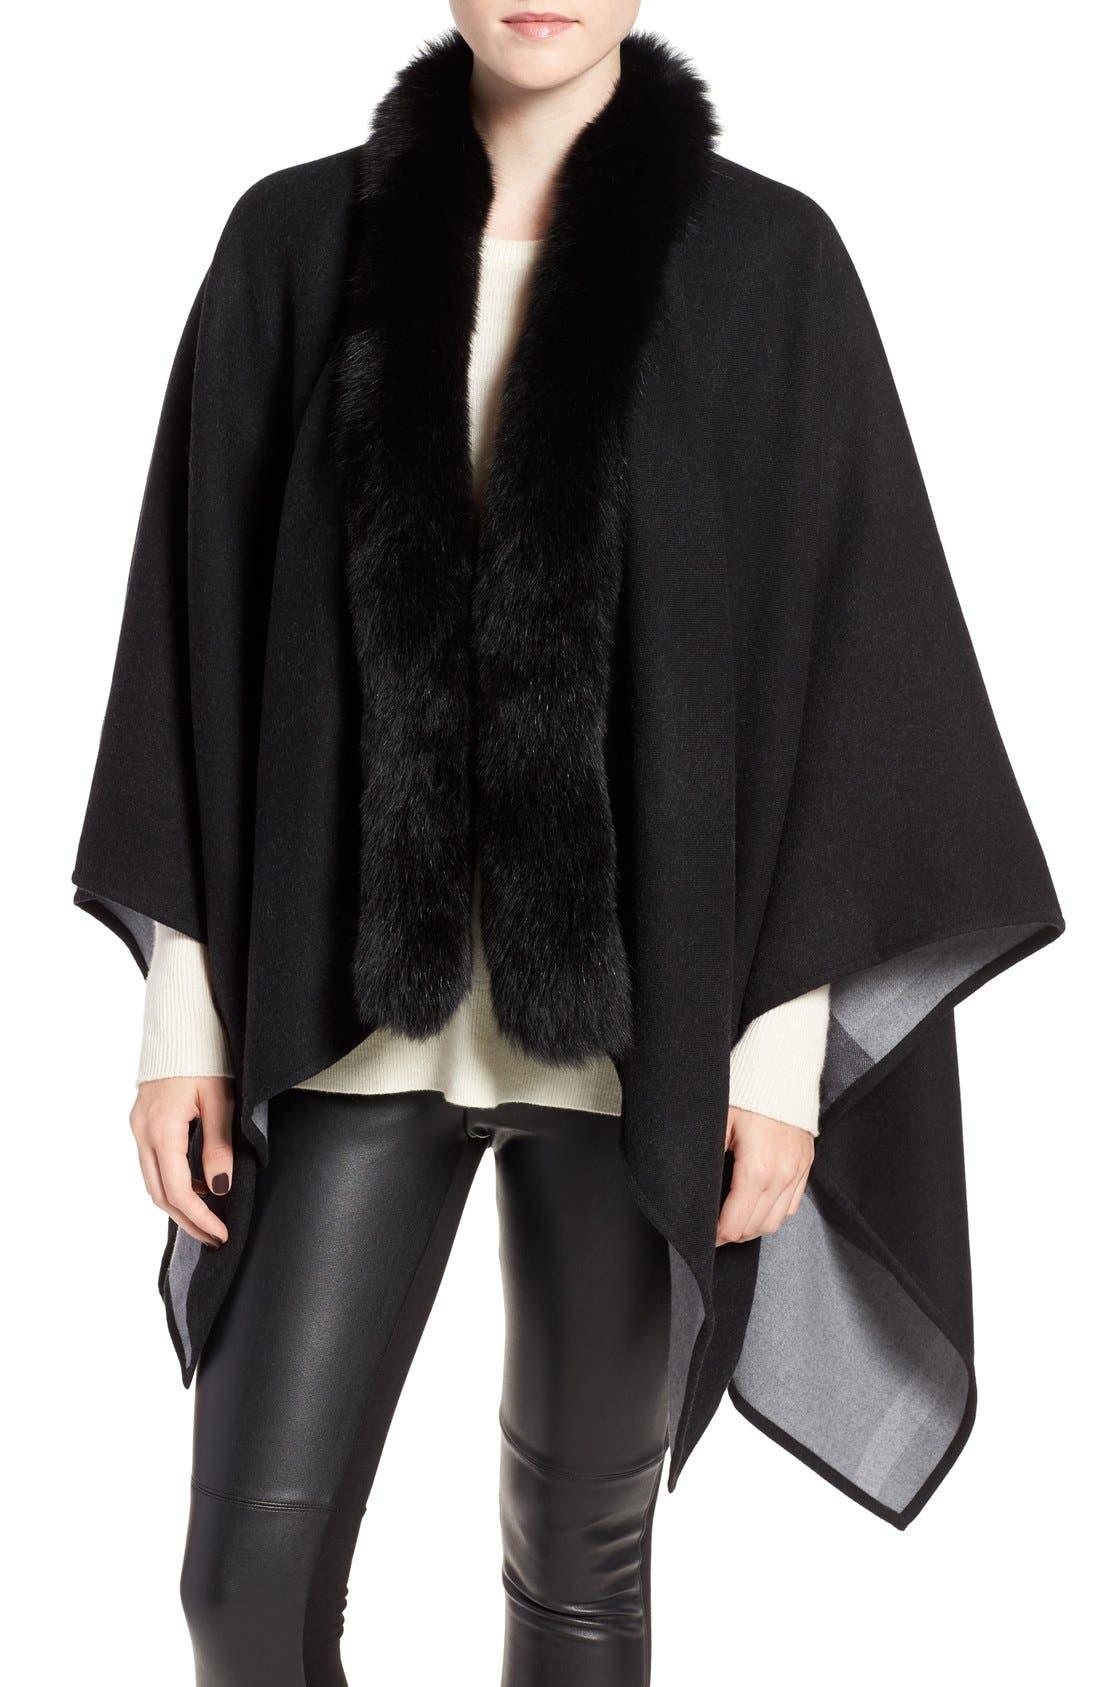 Main Image - Burberry Merino Wool Cape with Genuine Fox Fur Trim